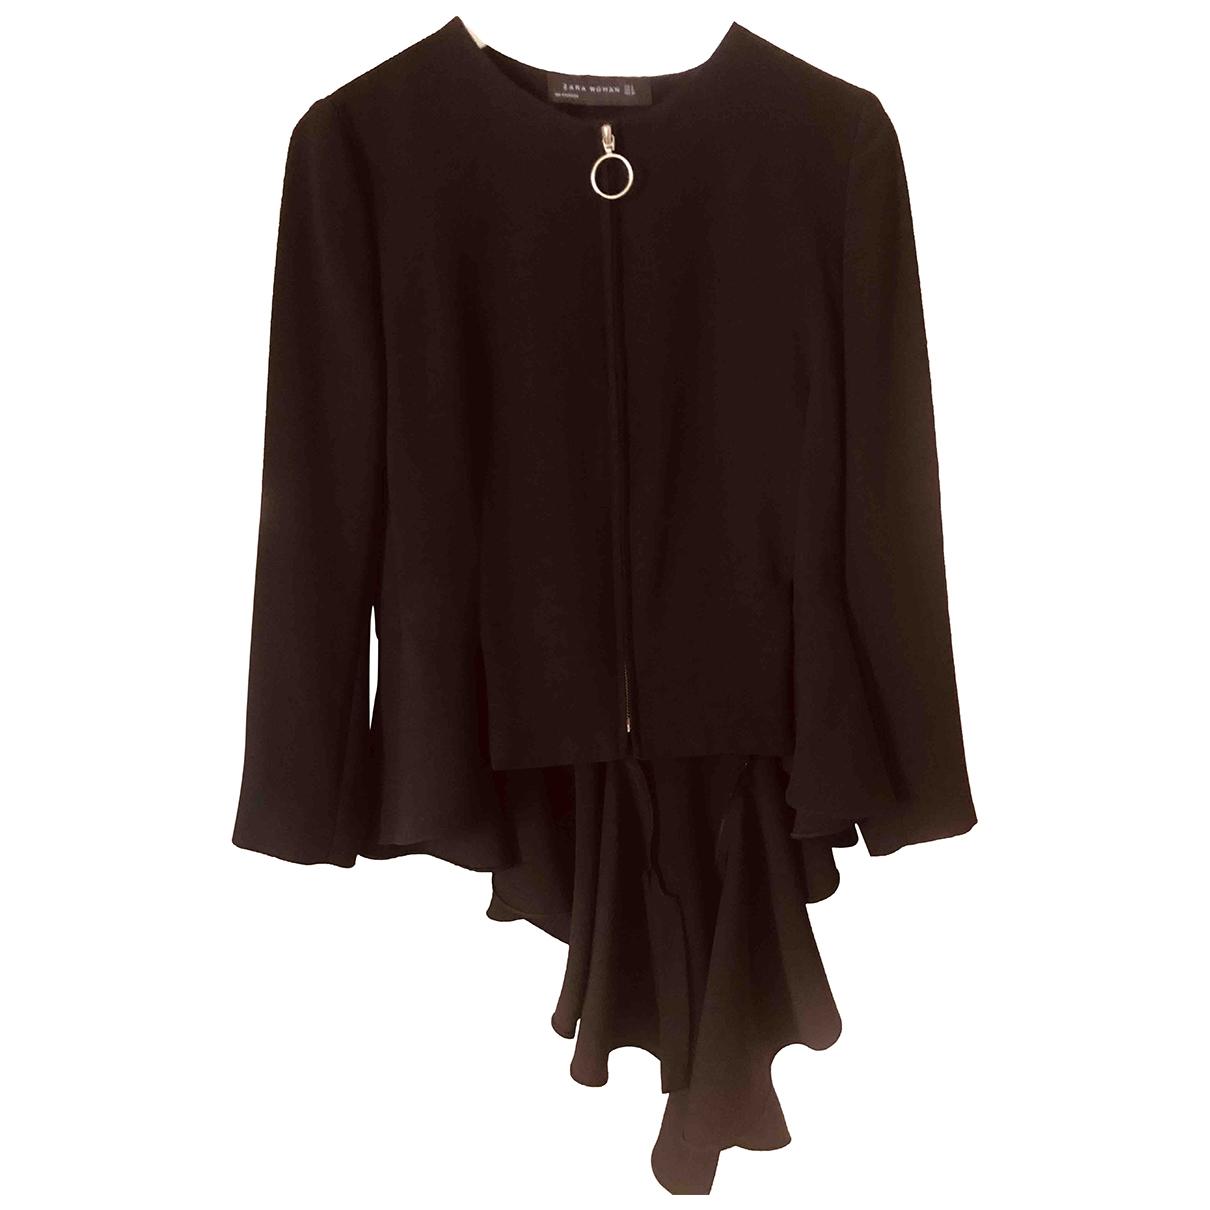 Zara \N Black jacket for Women S International